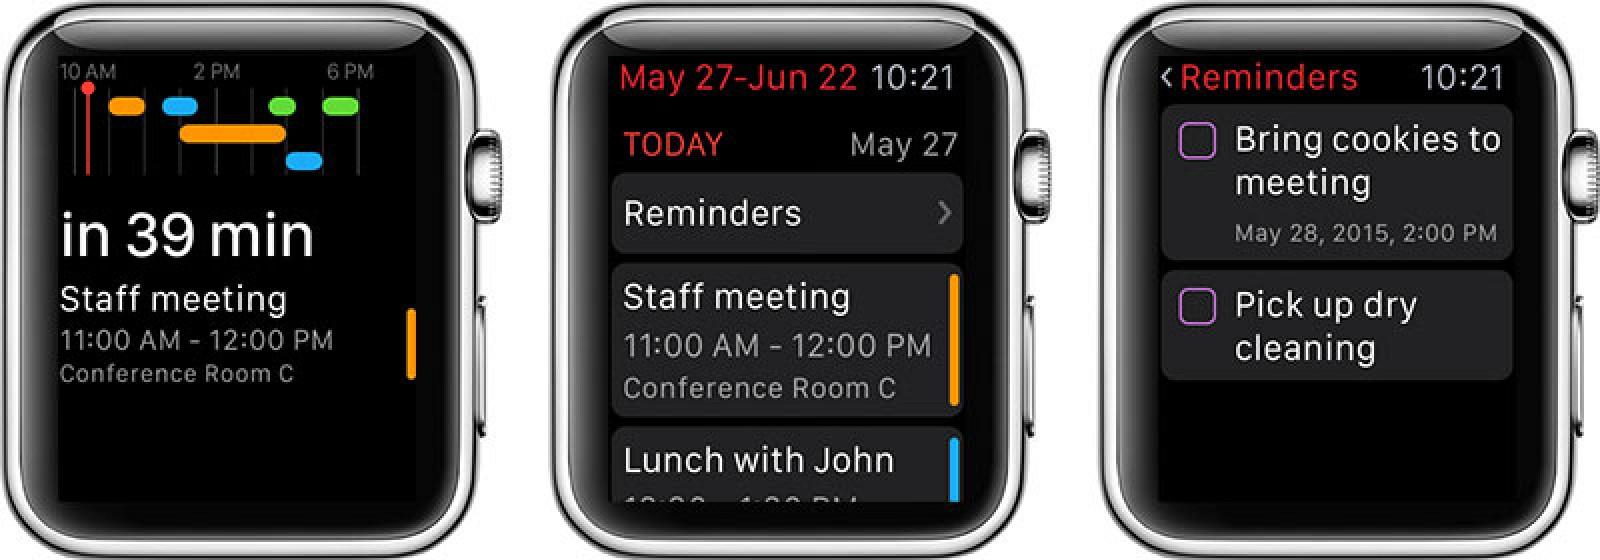 popular calendar app fantastical 2 now available for apple watch mac rumors